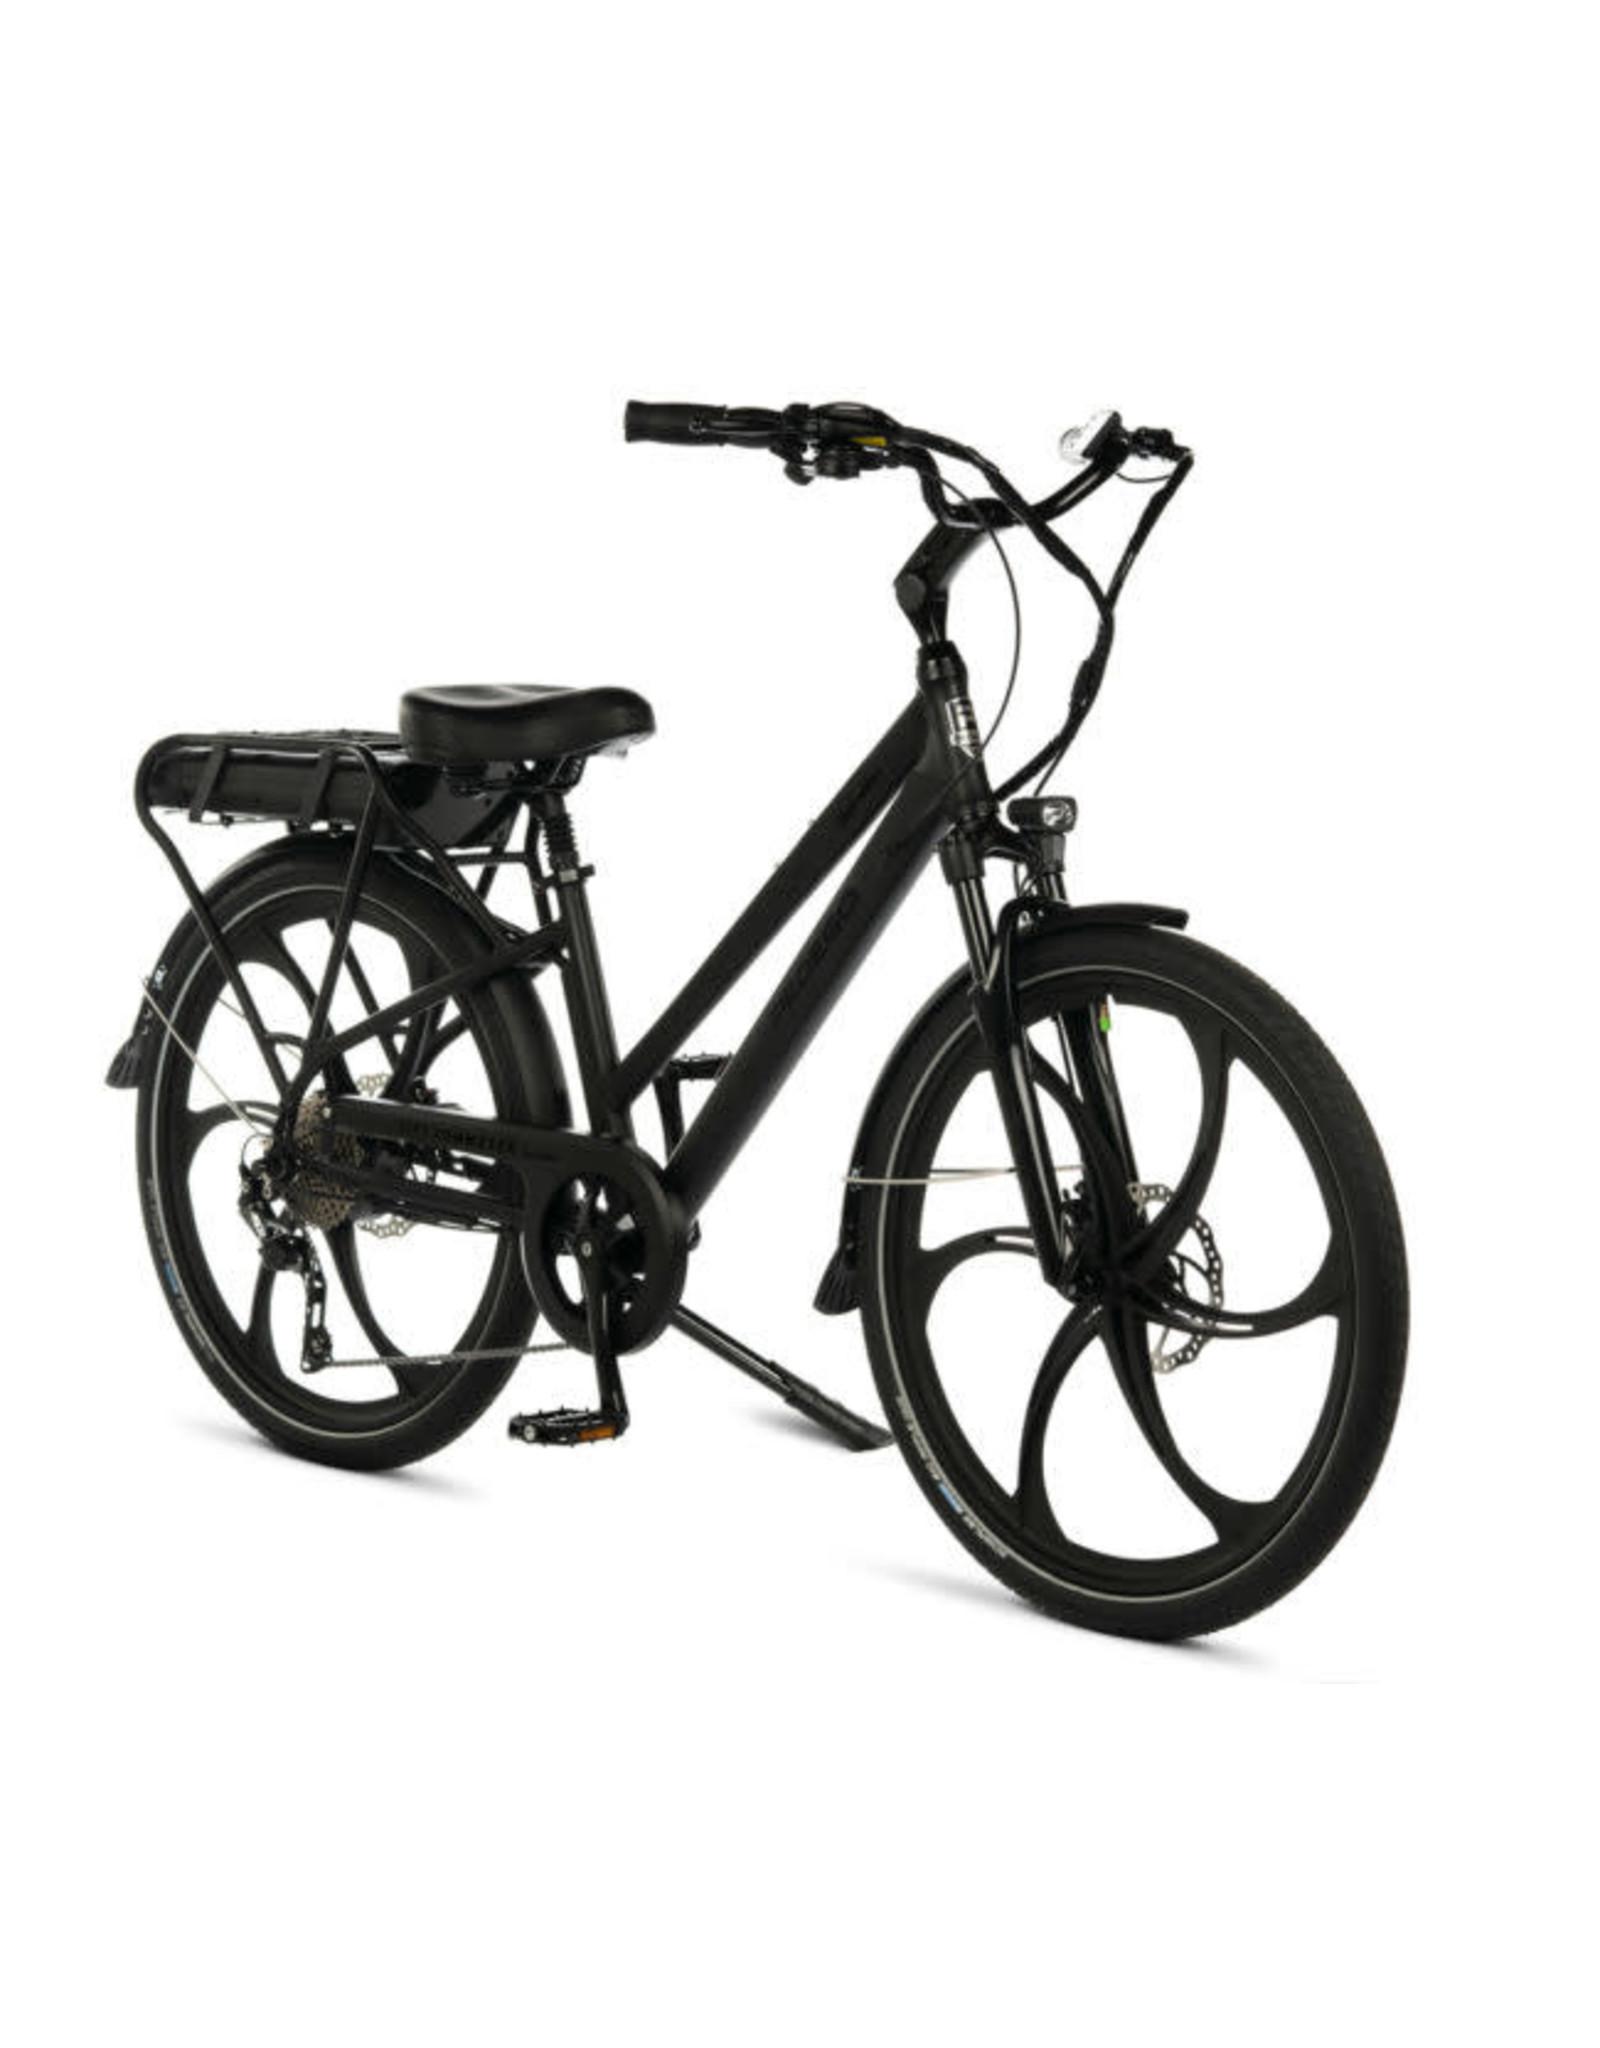 "Pedego Electric Bikes City Commuter 28"" Step Thru BLACK Edition w/ MAGNESIUM RIMS"